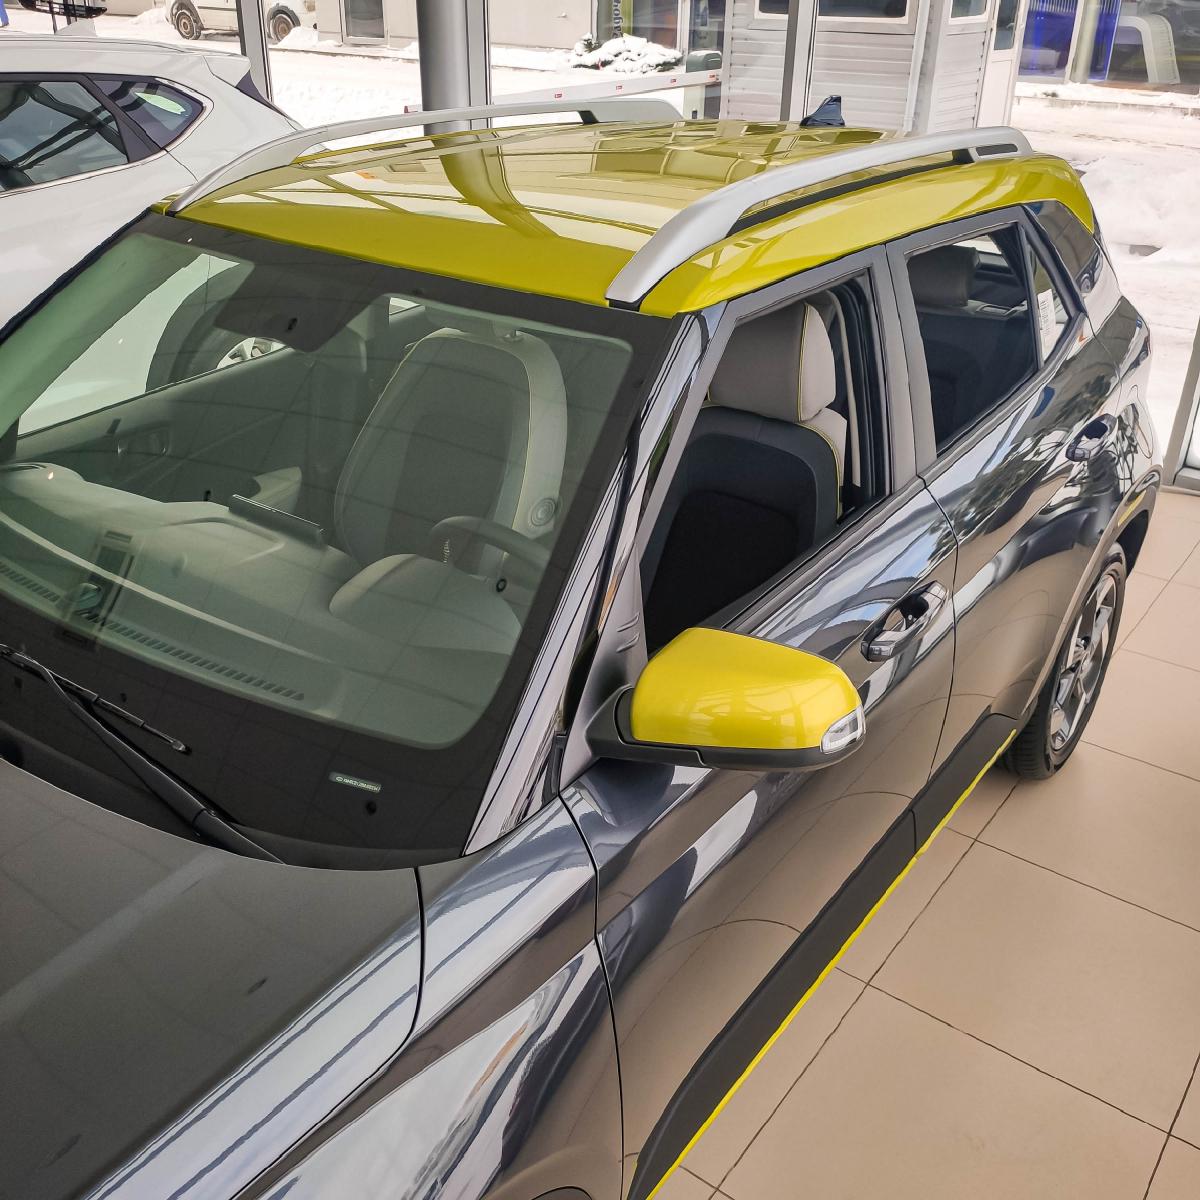 Абсолютно новий компактний міський кросовер Hyundai Venue | Хюндай Мотор Україна - фото 9